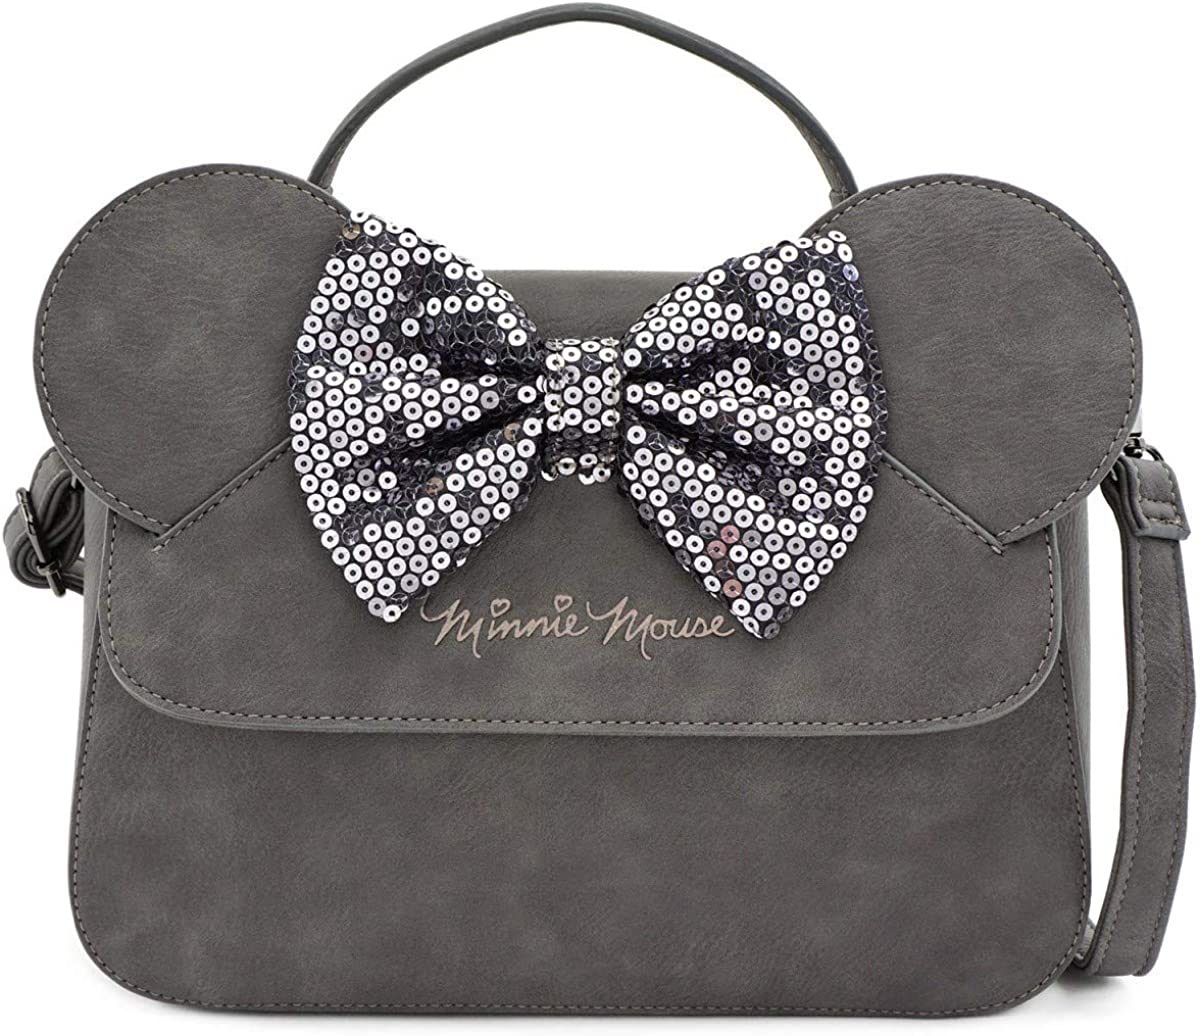 B07YGPV7D1 Loungefly x Minnie Mouse Sequin Bow Crossbody Bag 71p6qFRLdNL